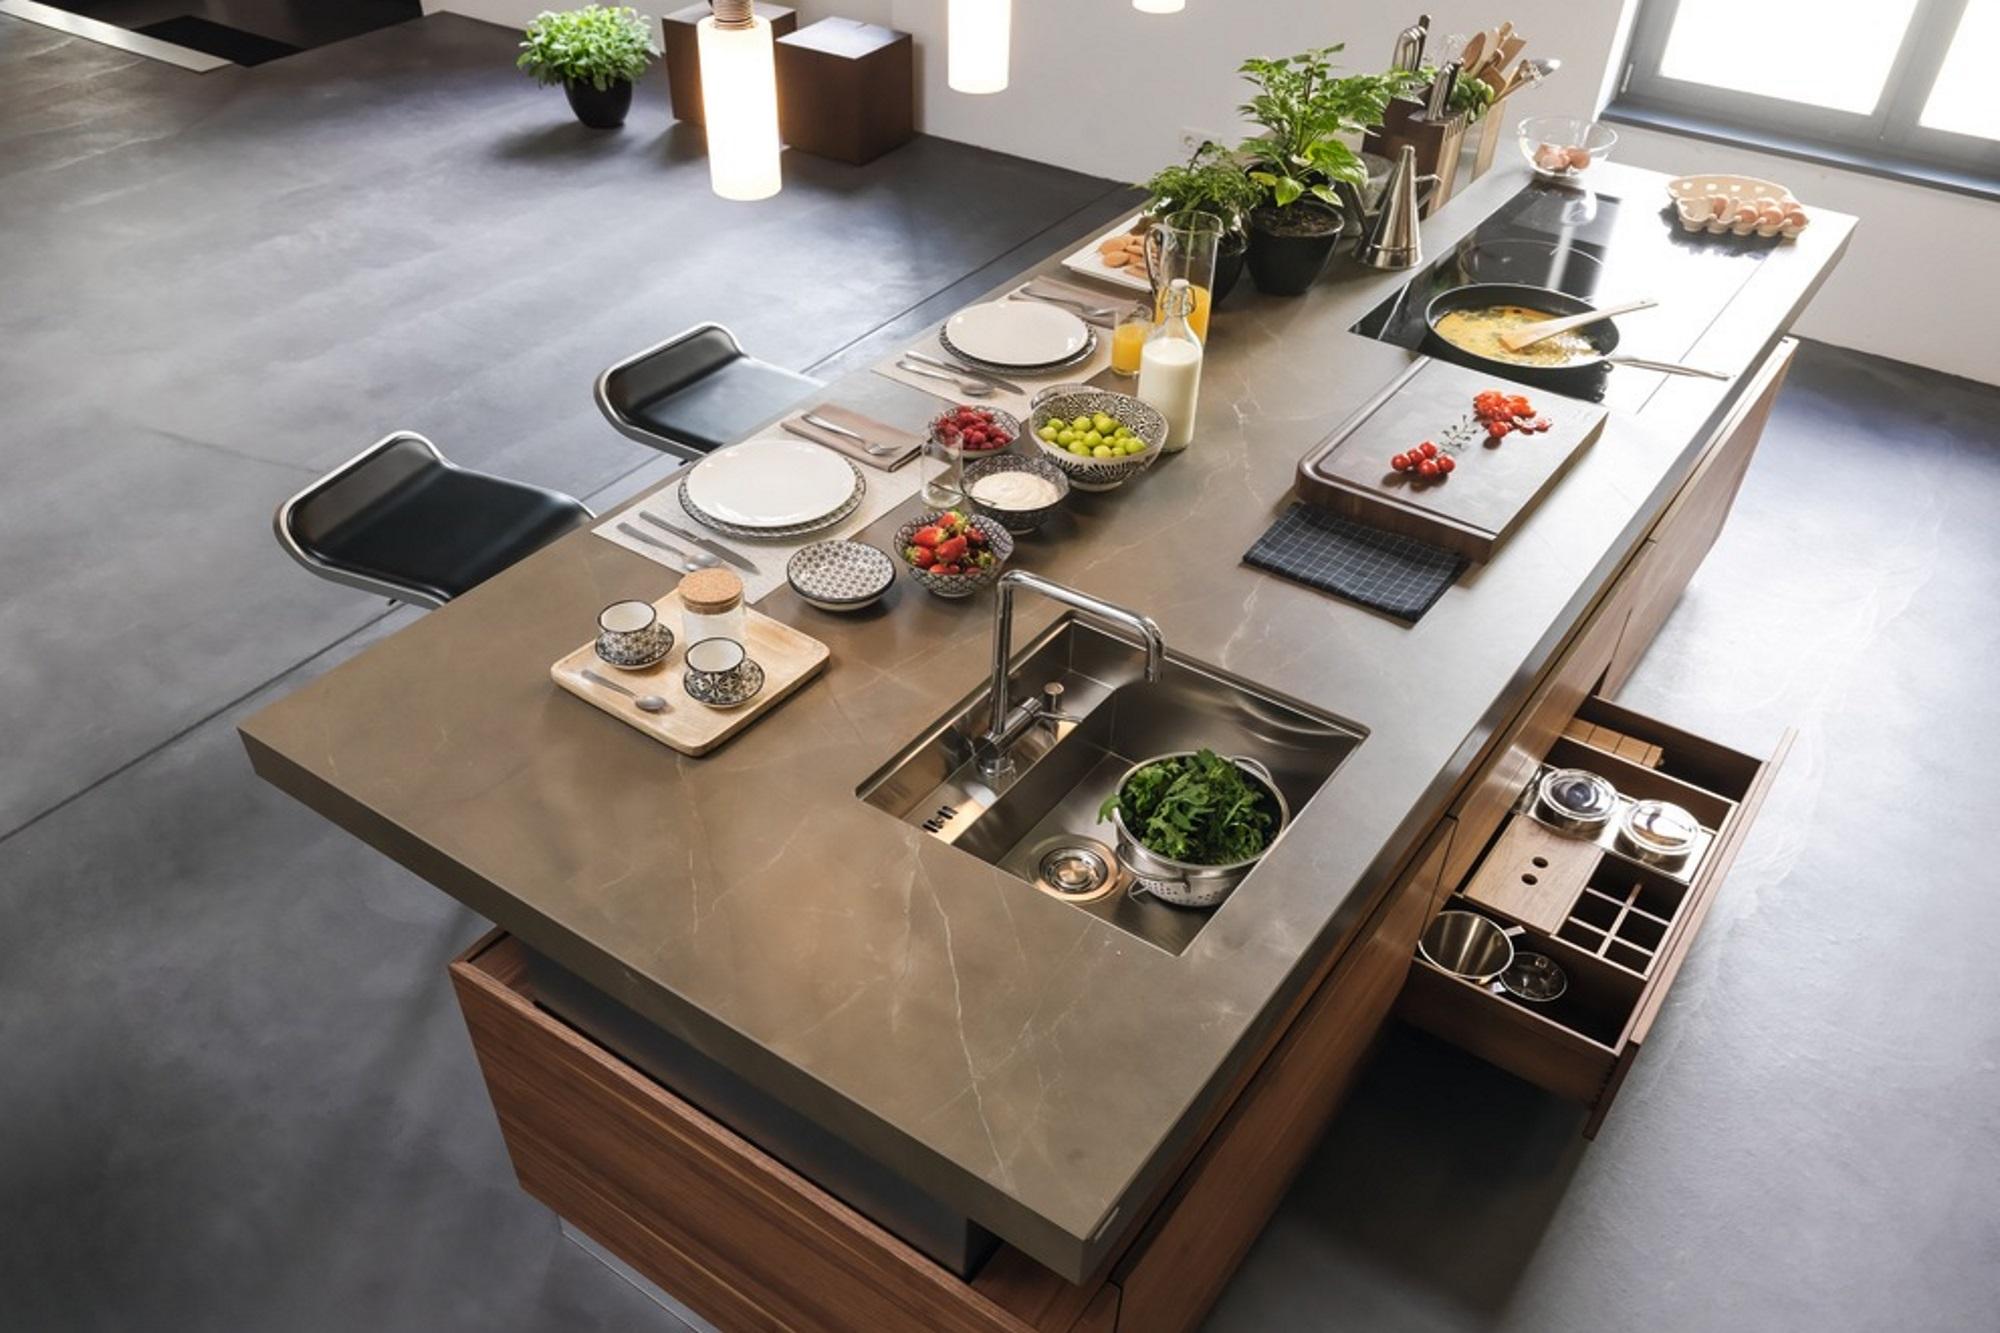 Kücheninsel Spüle Und Kochfeld